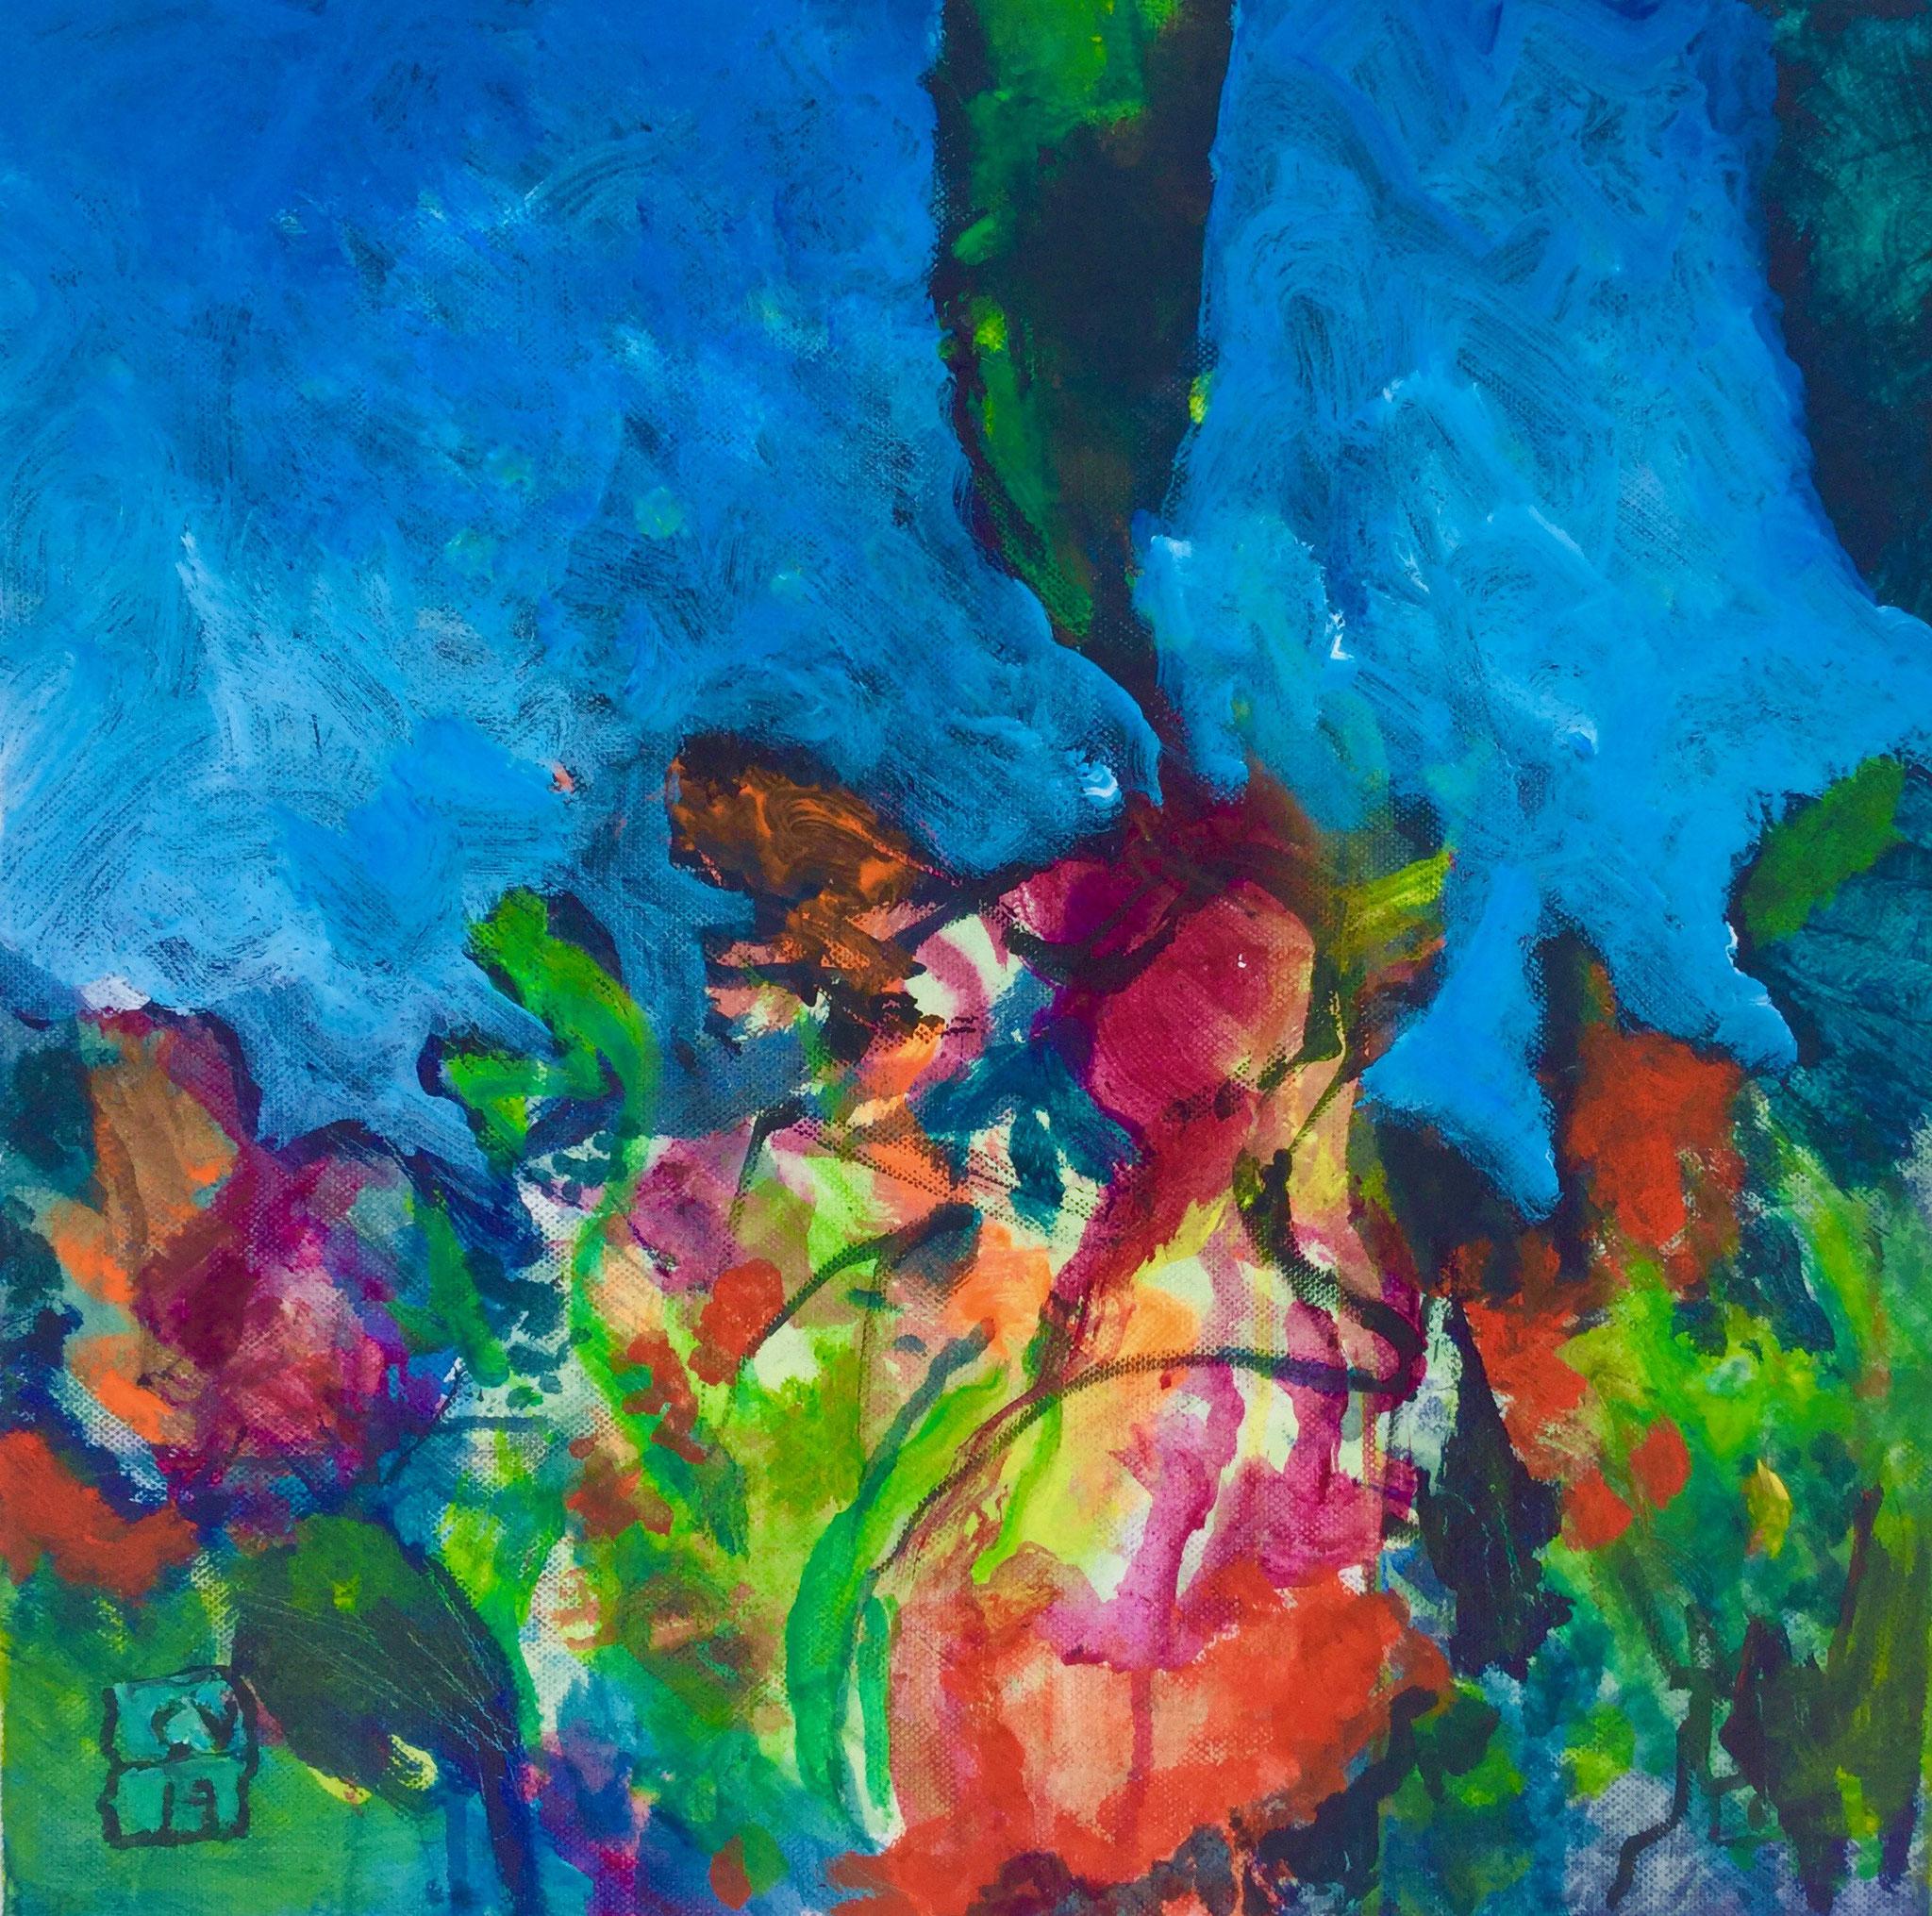 Paysage - 2017 - 40 x 40 cm